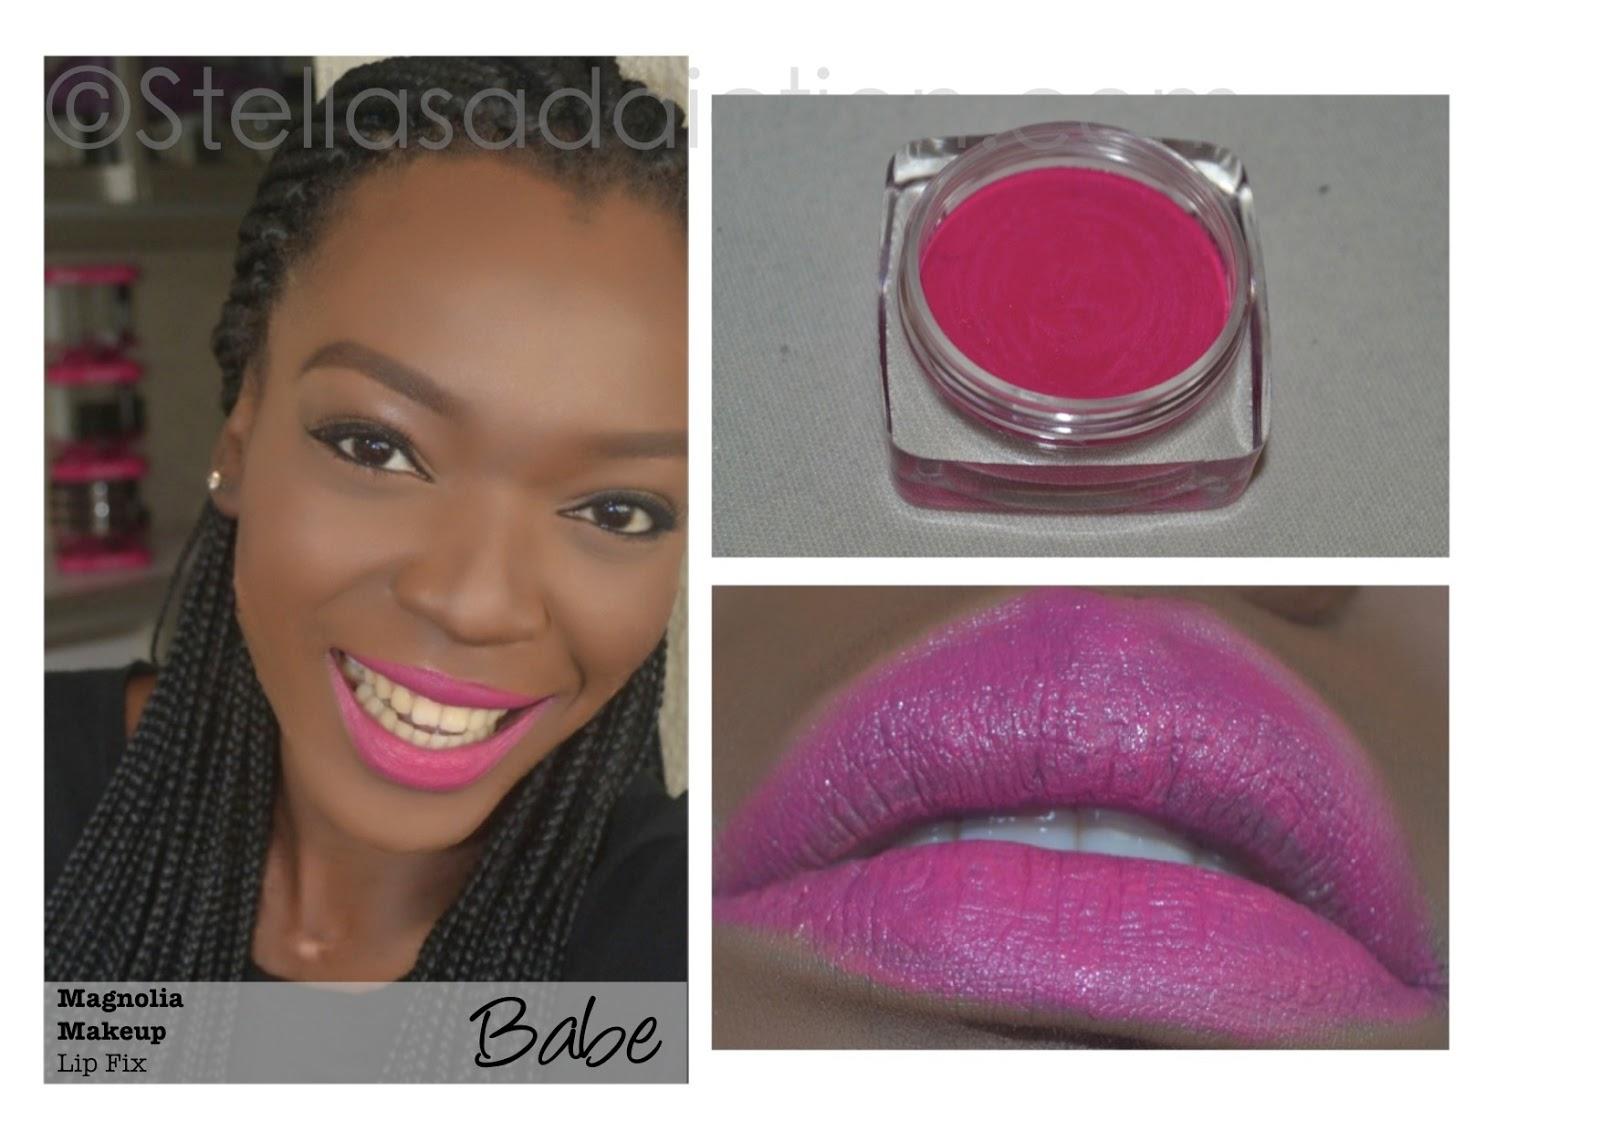 Product Review: Magnolia Makeup Lip Fix* - Stellau0026#39;s Addiction